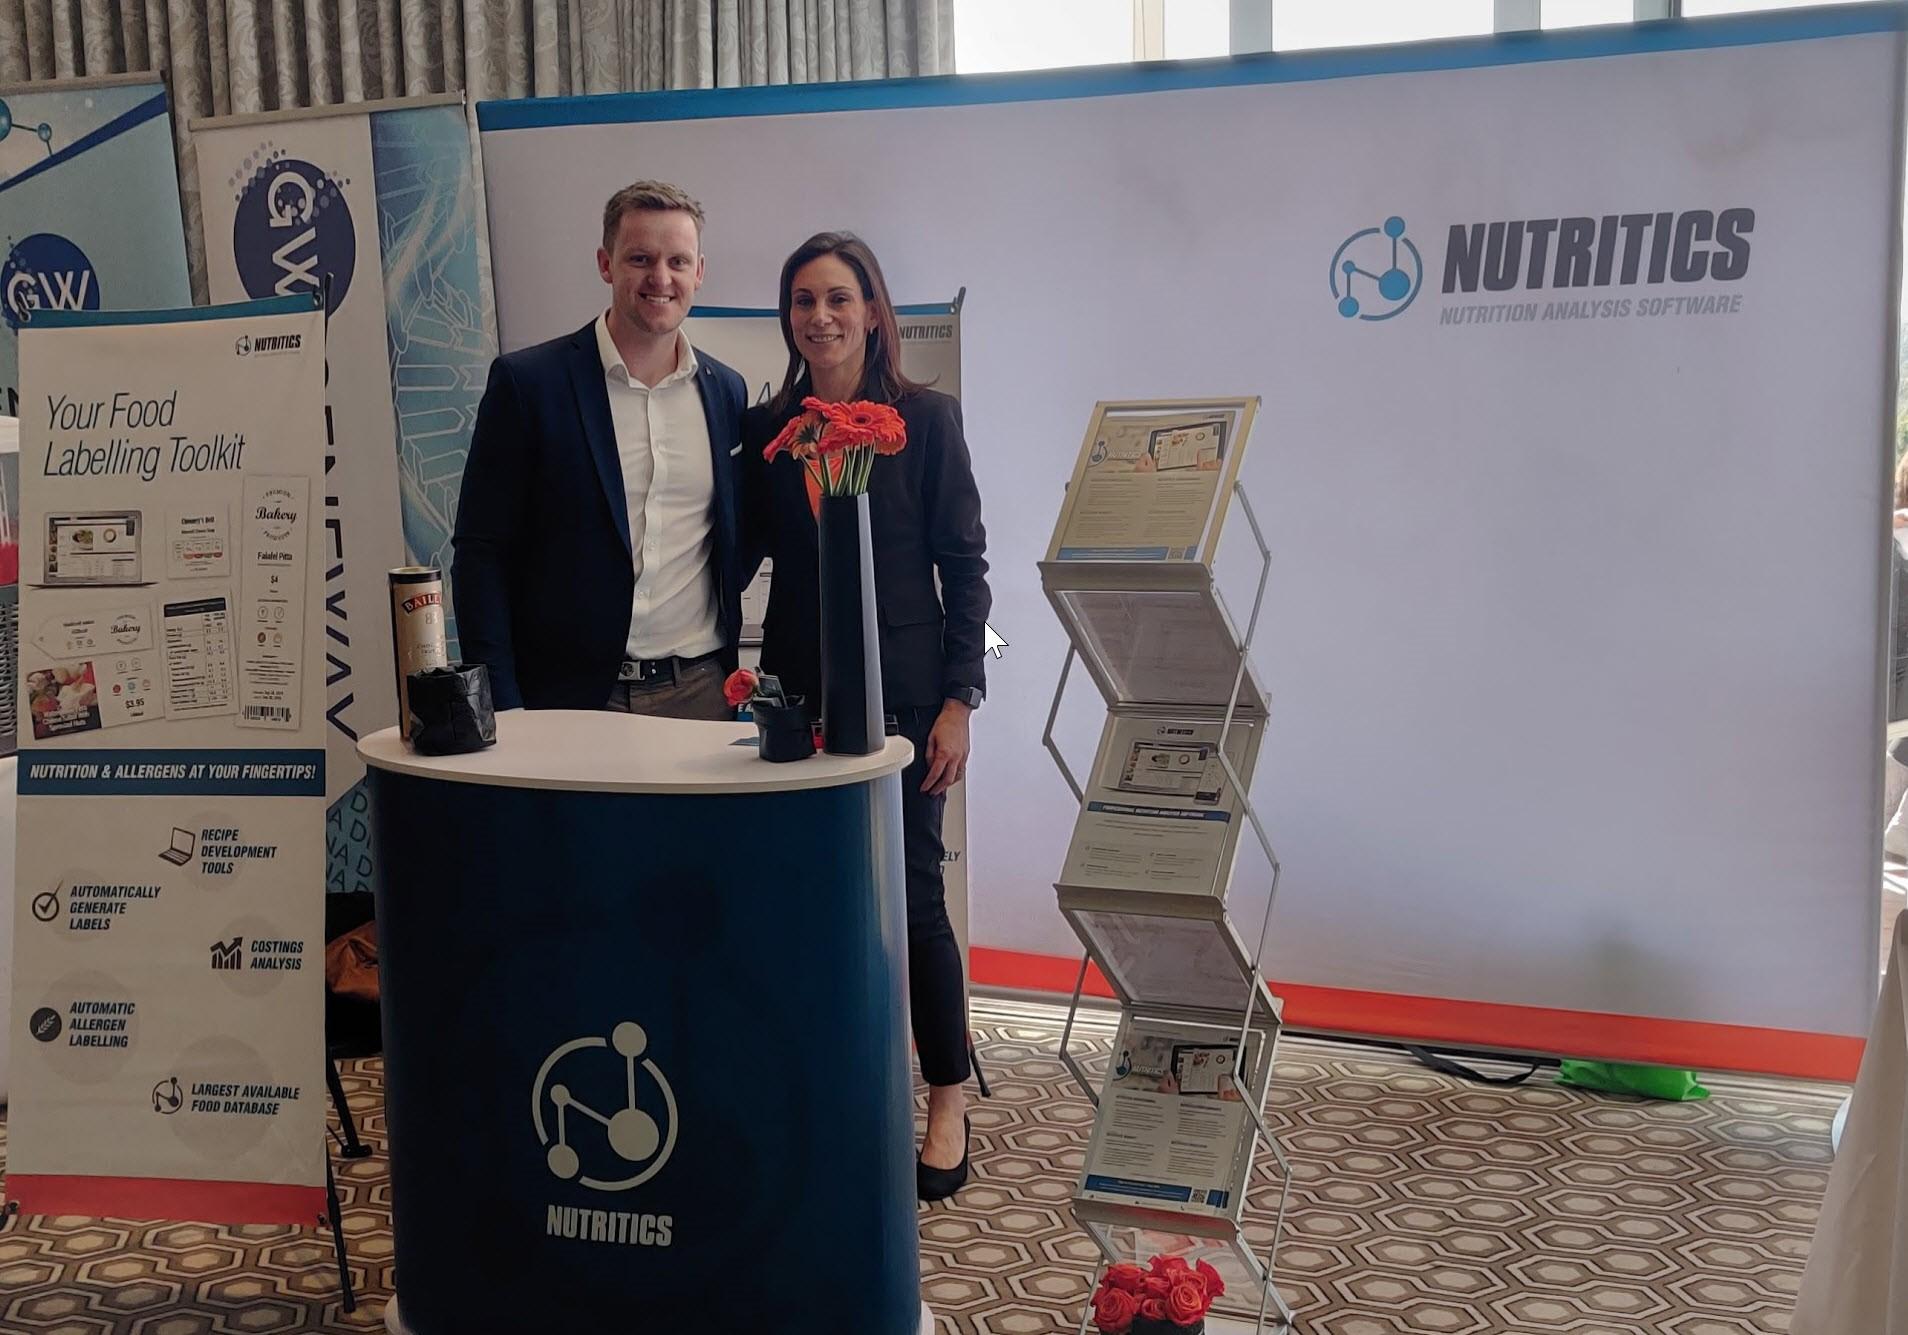 Damian O'Kelly (CEO Nutritics) and Leigh-Ann Silber (Dietitian and Nutritics local partner)